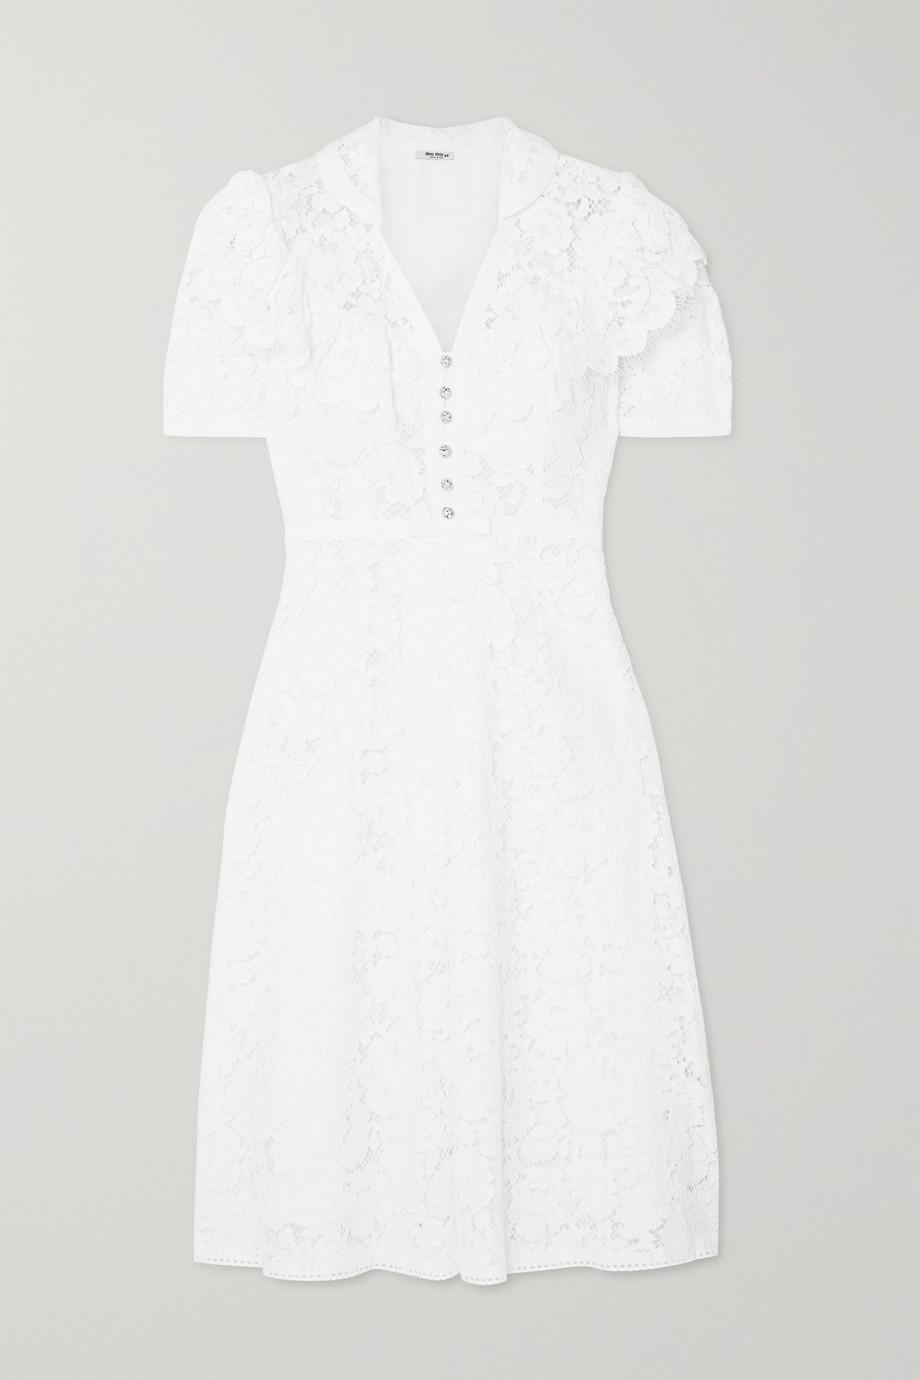 Miu Miu Crystal-embellished corded cotton-blend lace midi dress